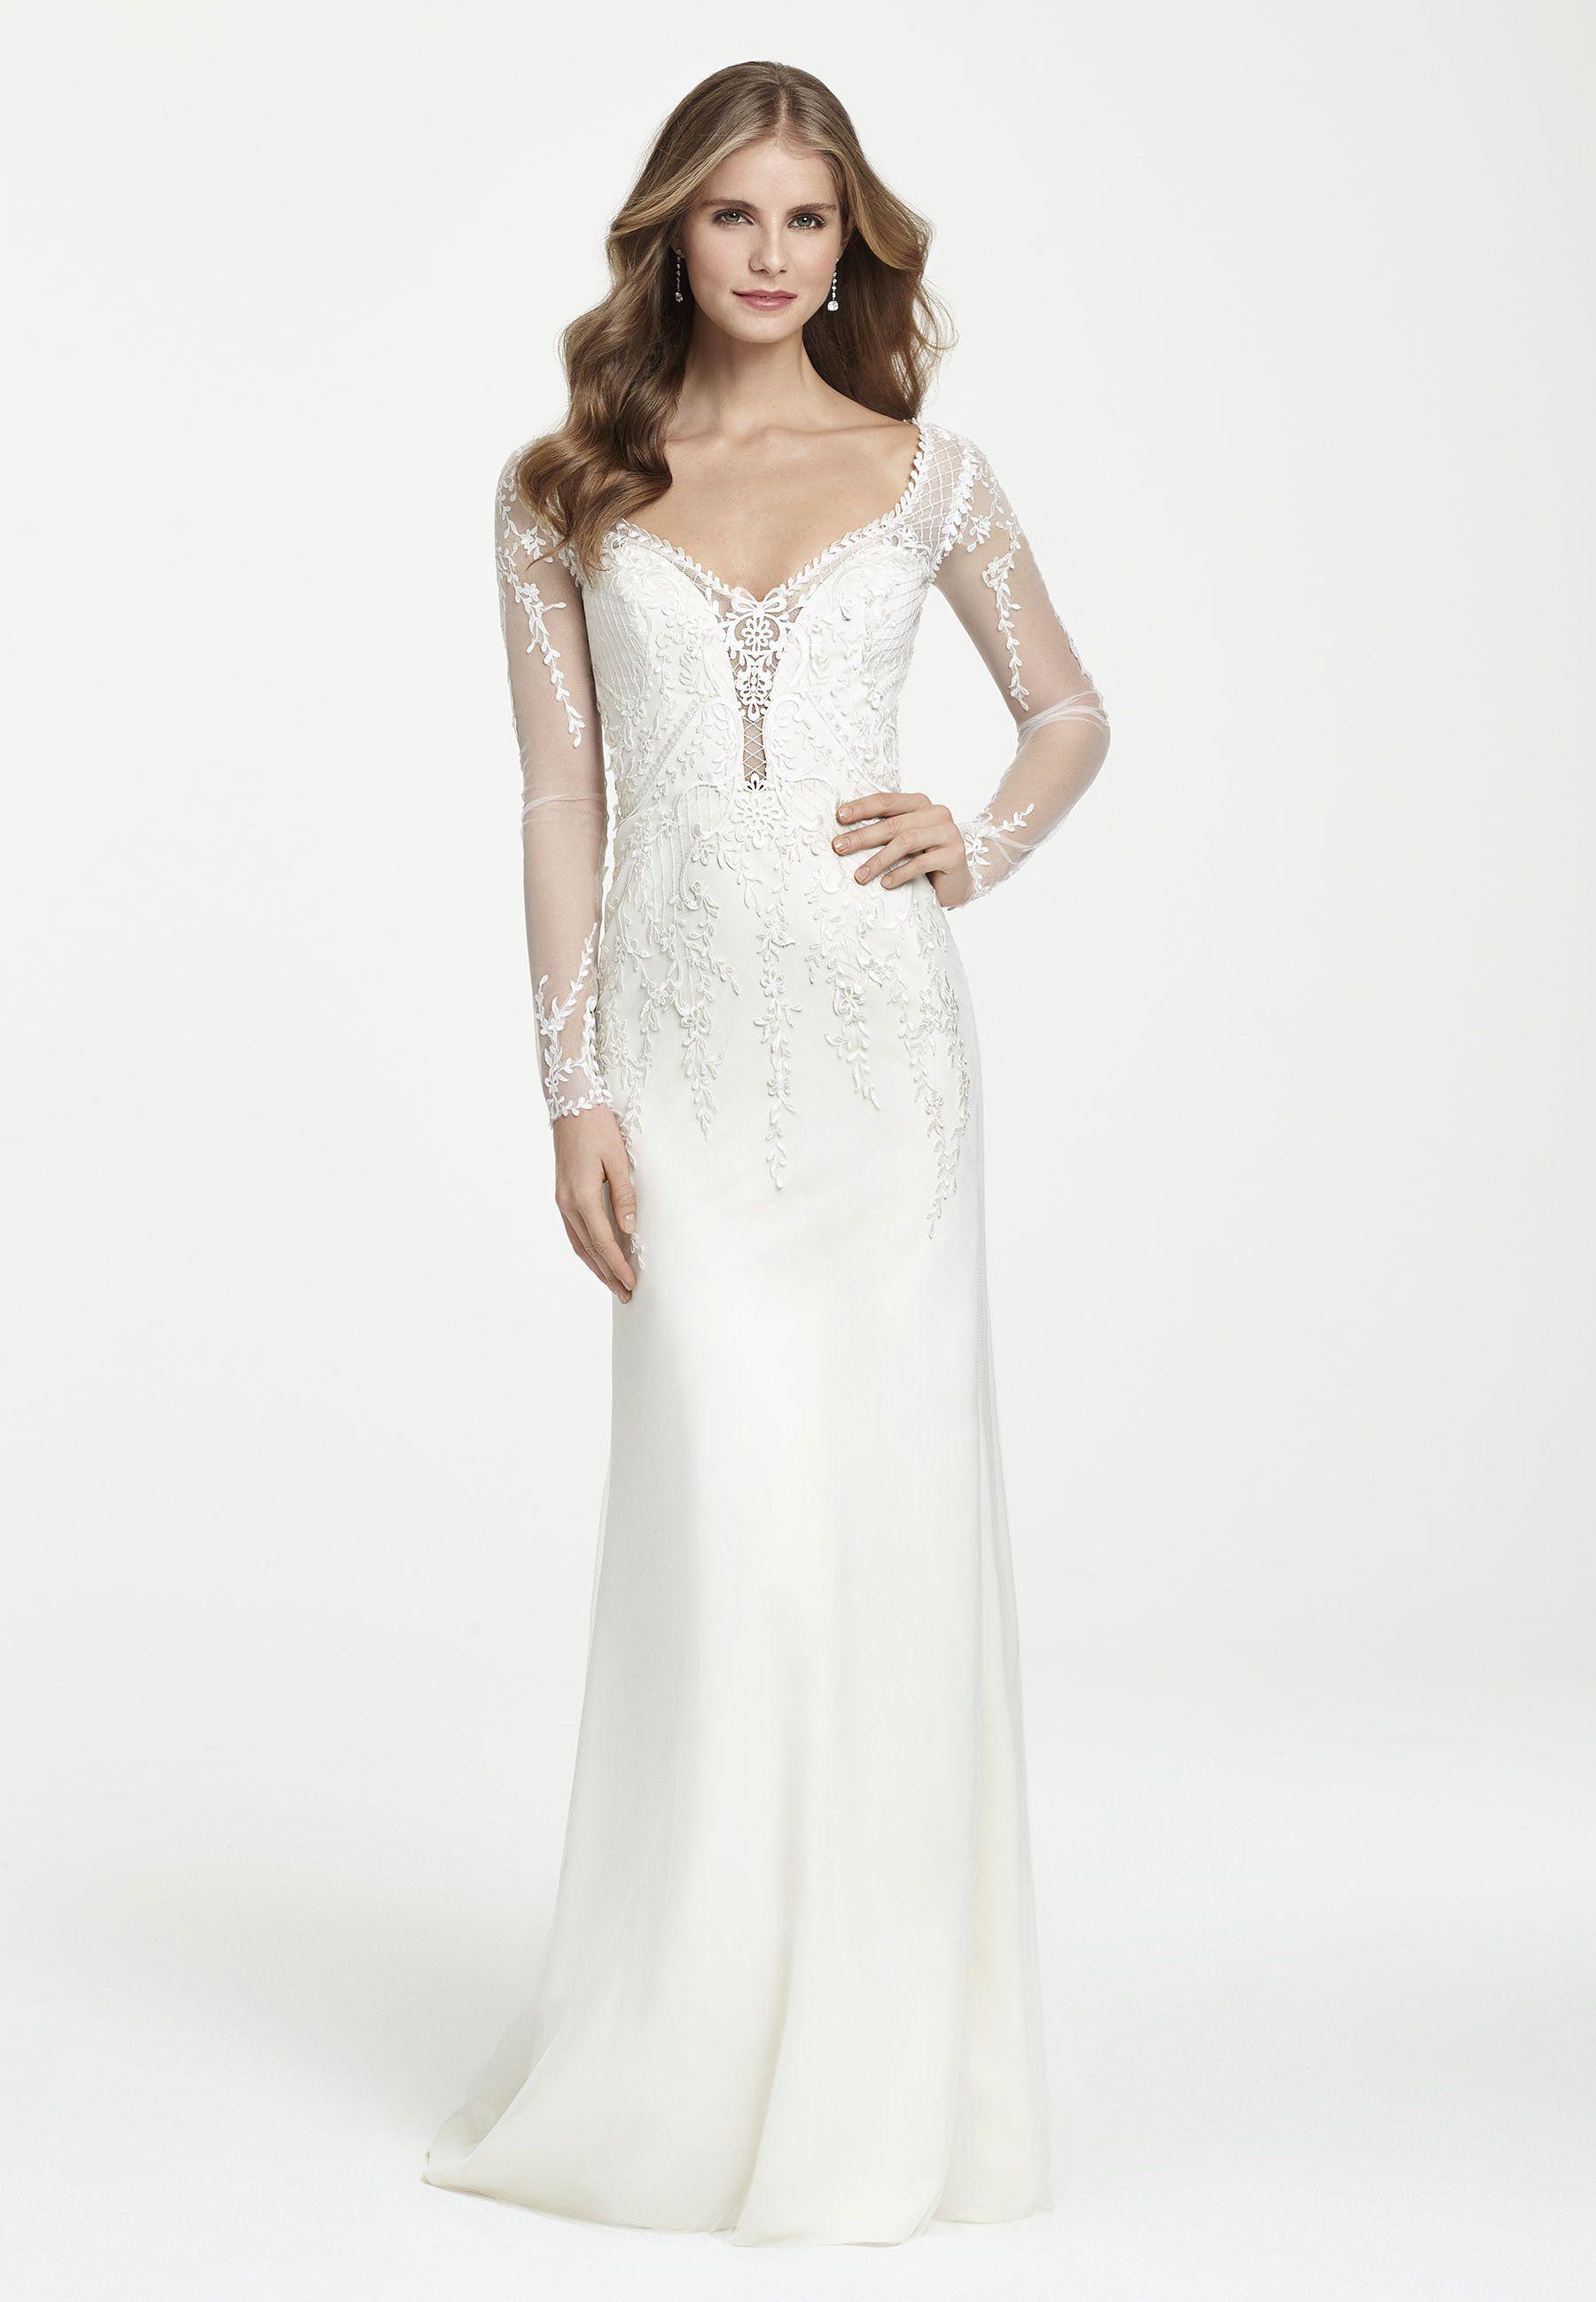 Wedding dresses stores  Luna Castilho for JLM Couture l Ti Adora l Fall  l Style